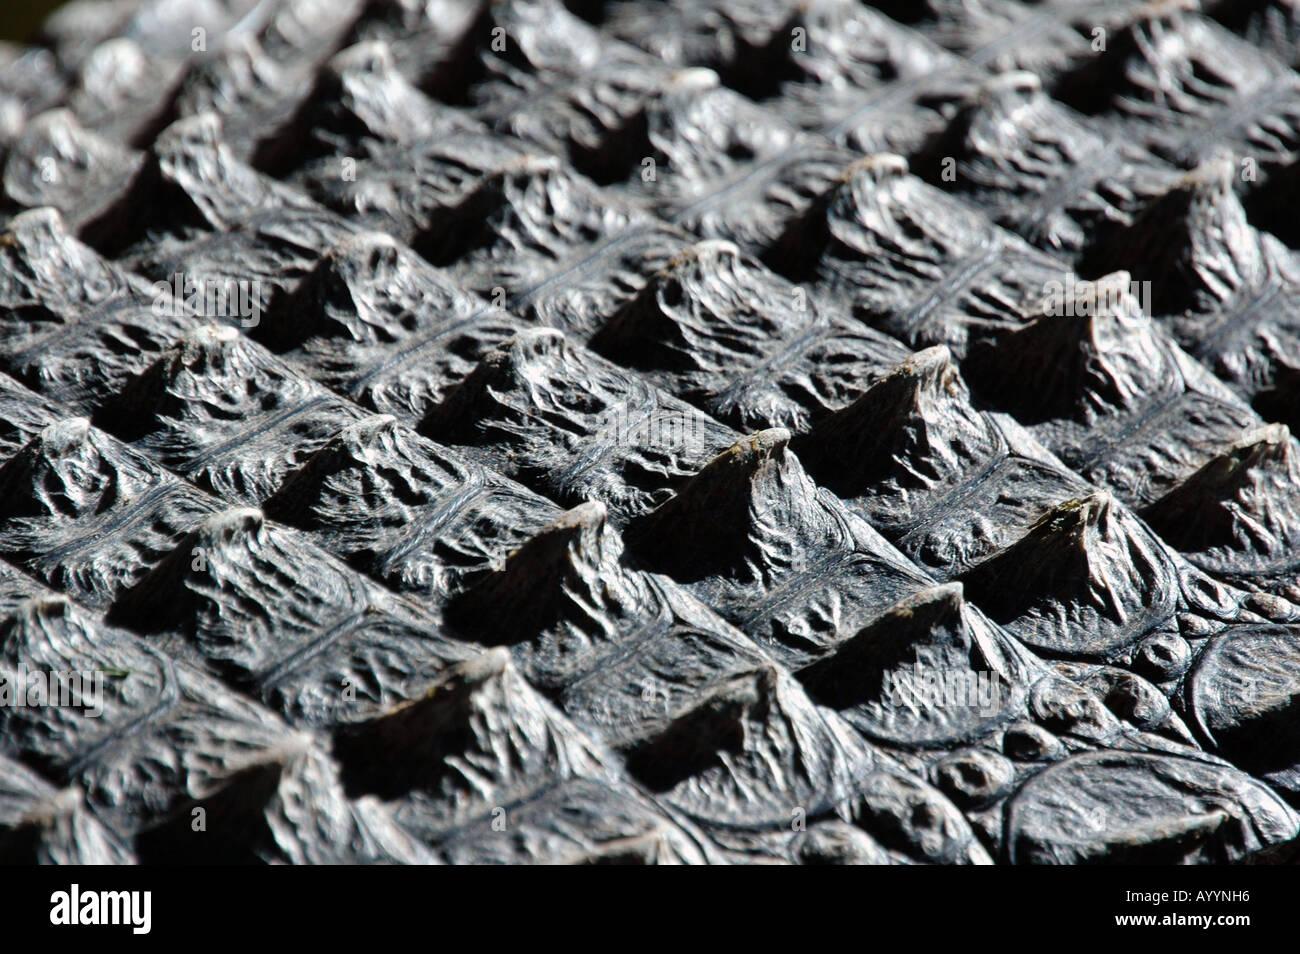 Croc textura - Stock Image